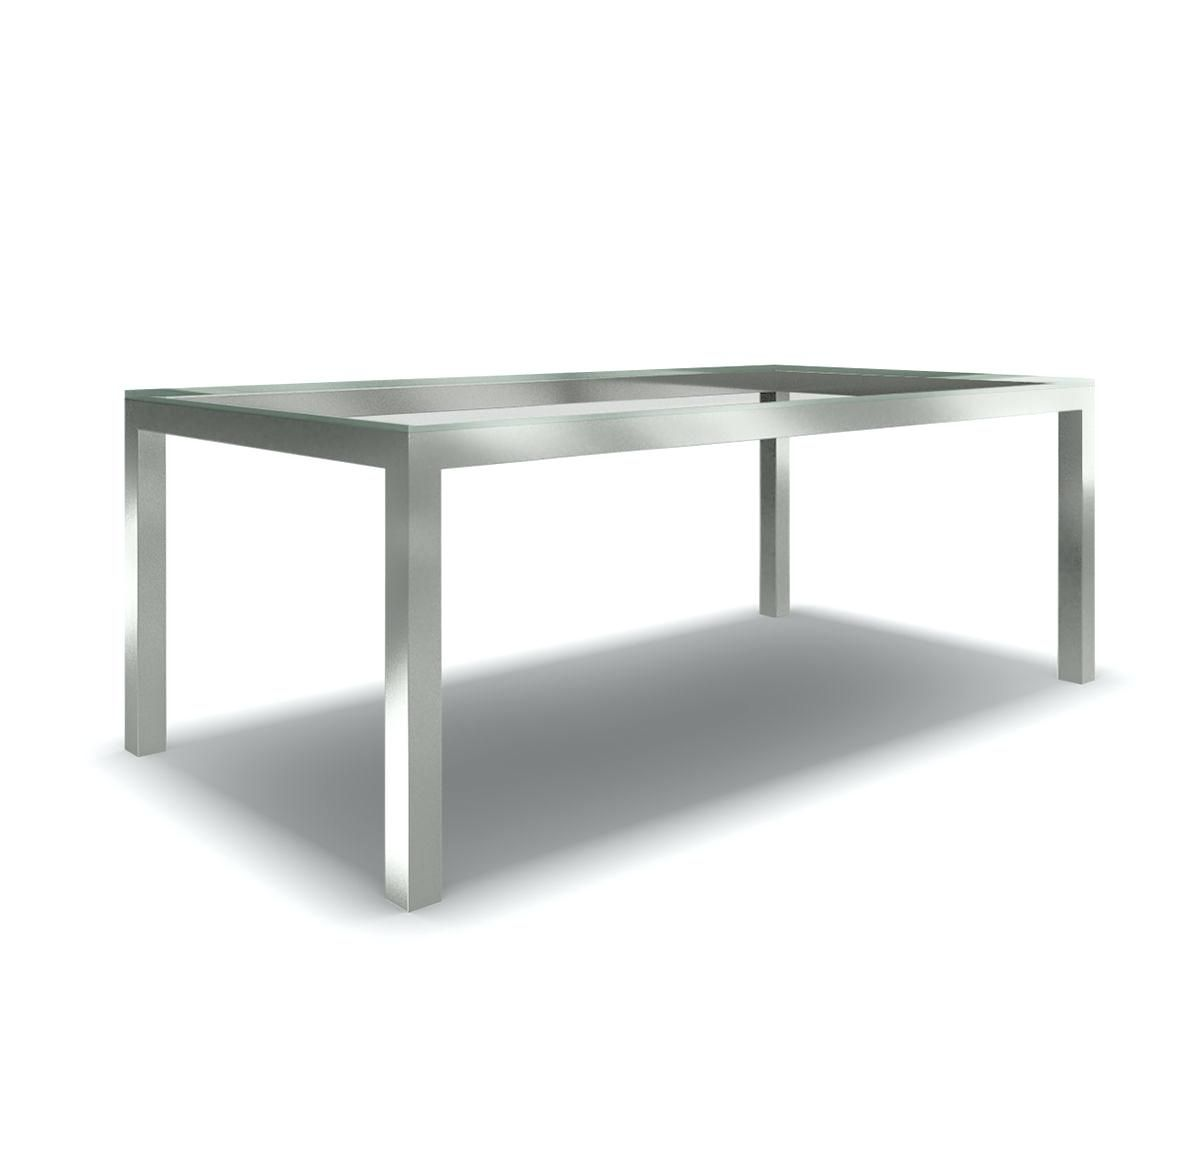 9 Adjustable Height Coffee Table Ikea Images Di 2020 Ikea